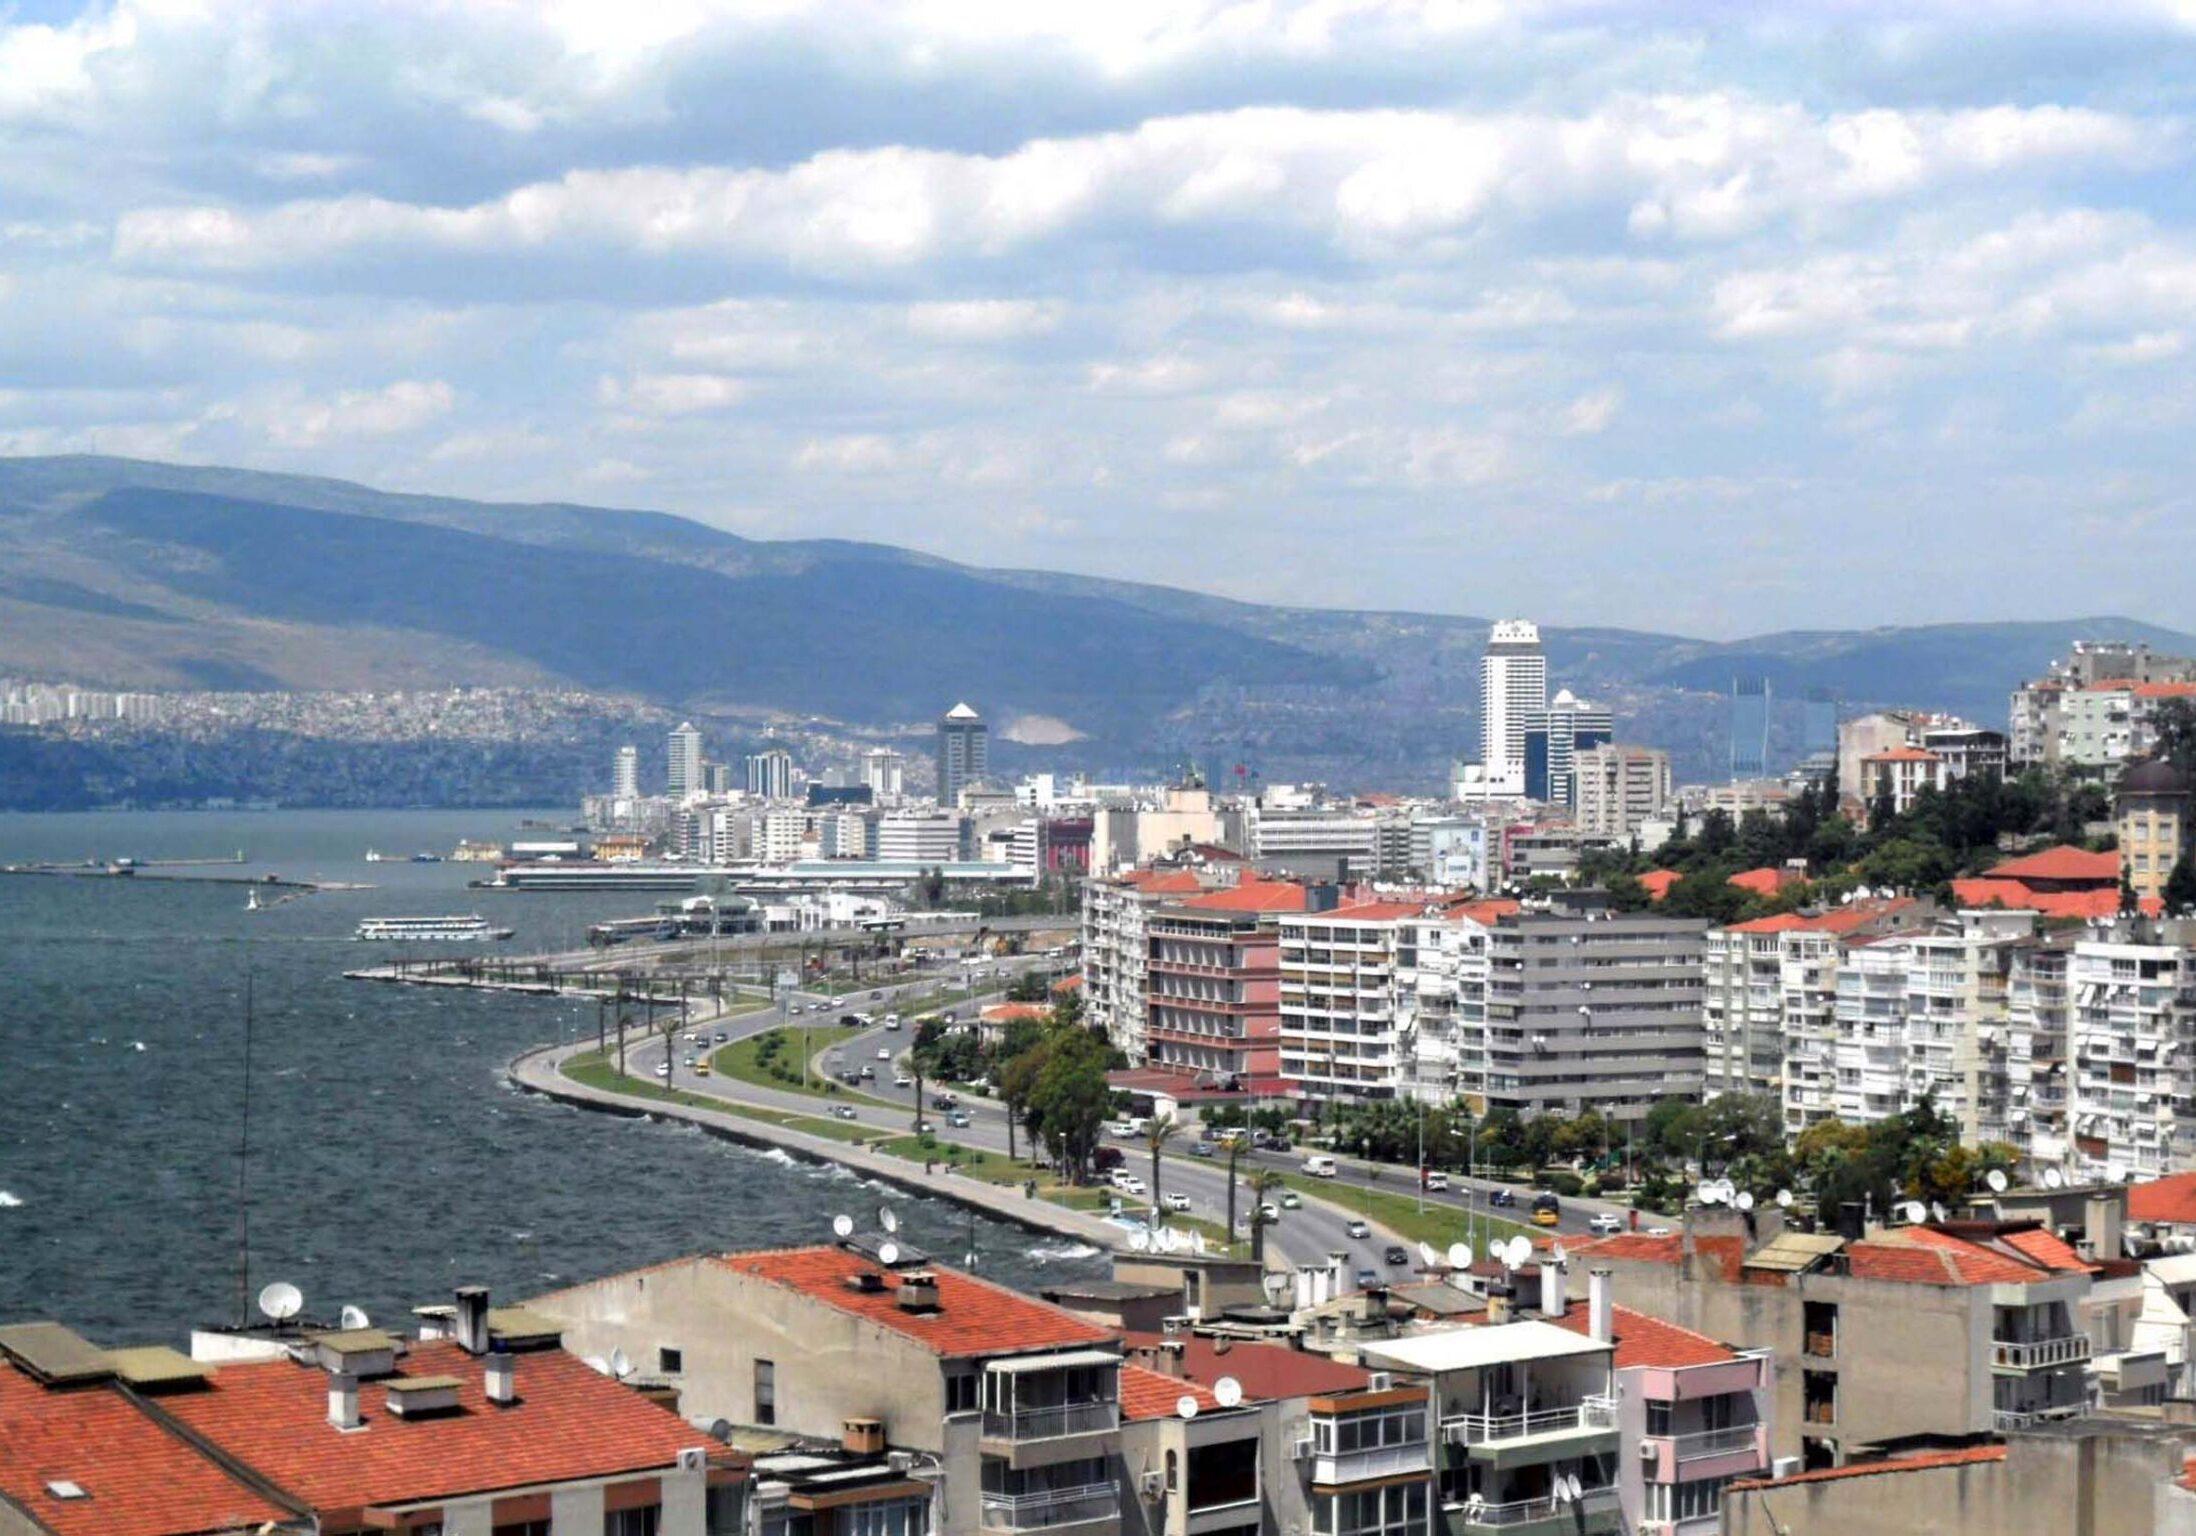 Izmir, Turkey was struck by a magnitude 7 earthquake on Oct. 31, 2020. (Photo by Nedim Ardoğa)